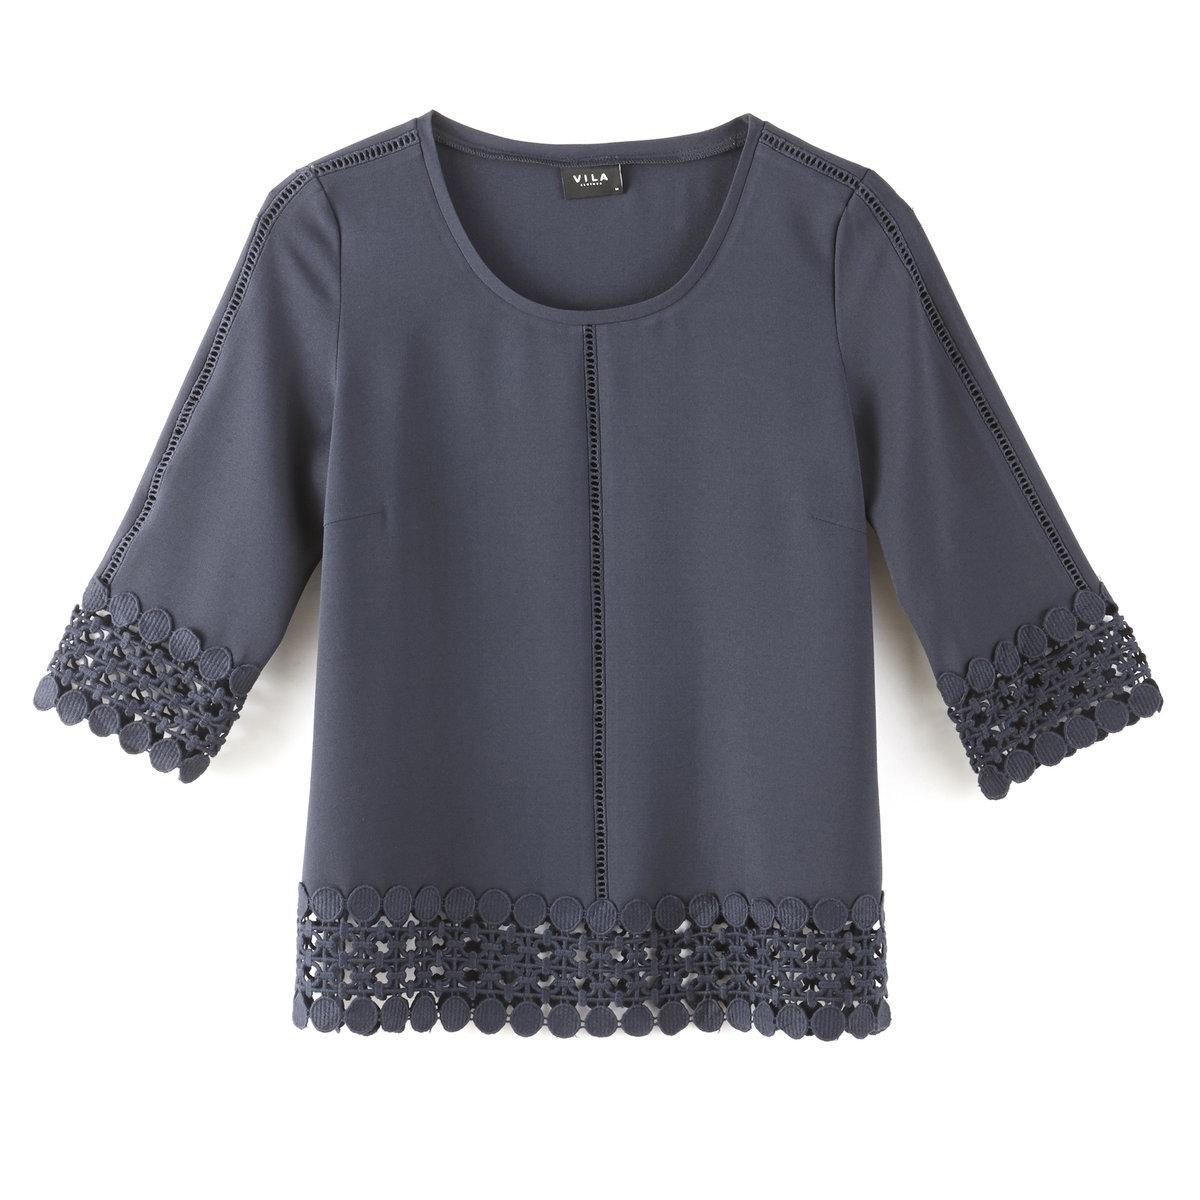 Блузка с рукавами 3/4 из гипюра